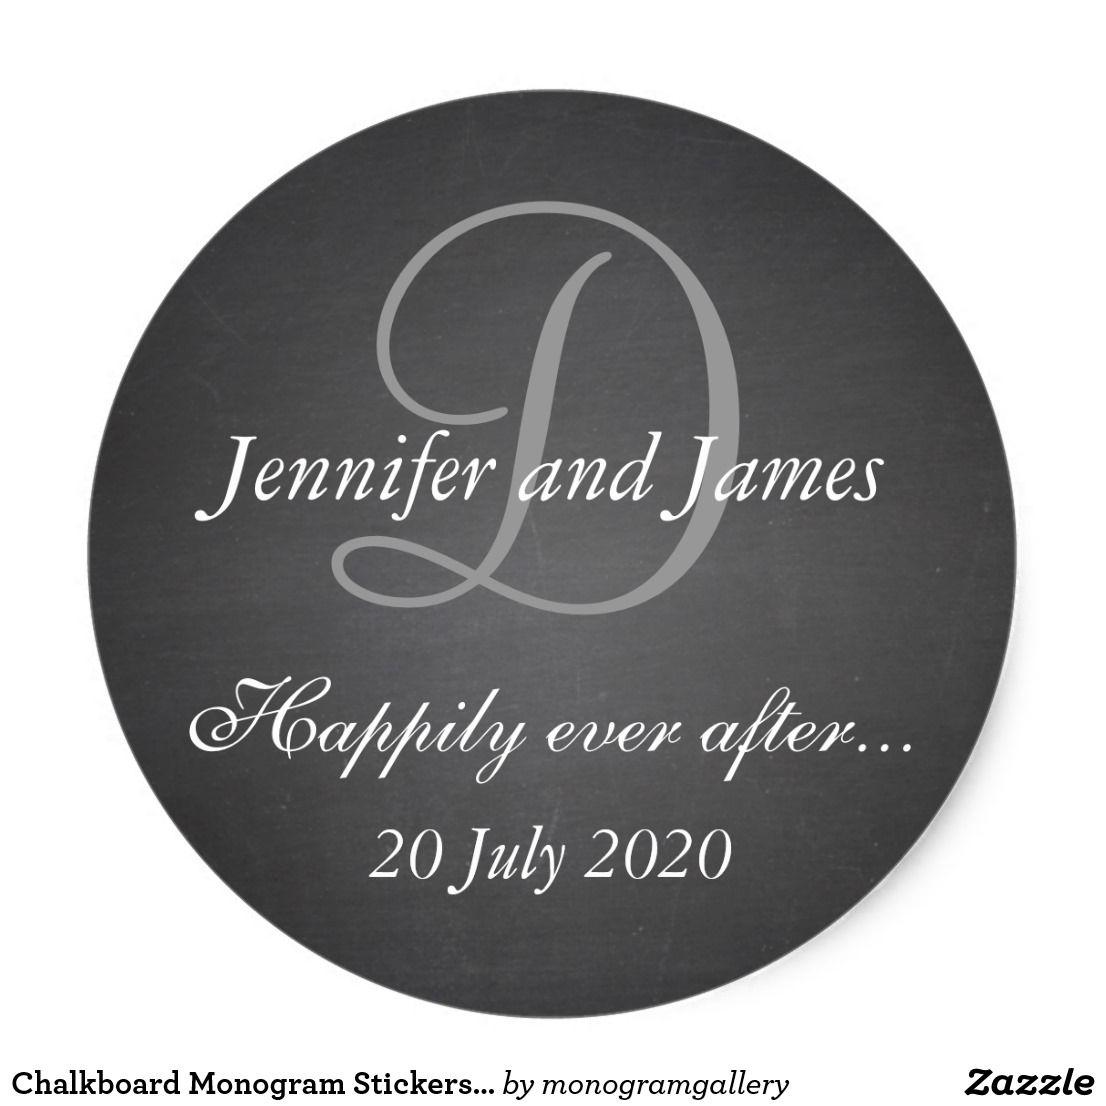 Chalkboard Monogram Stickers For Wedding Favors Wedding